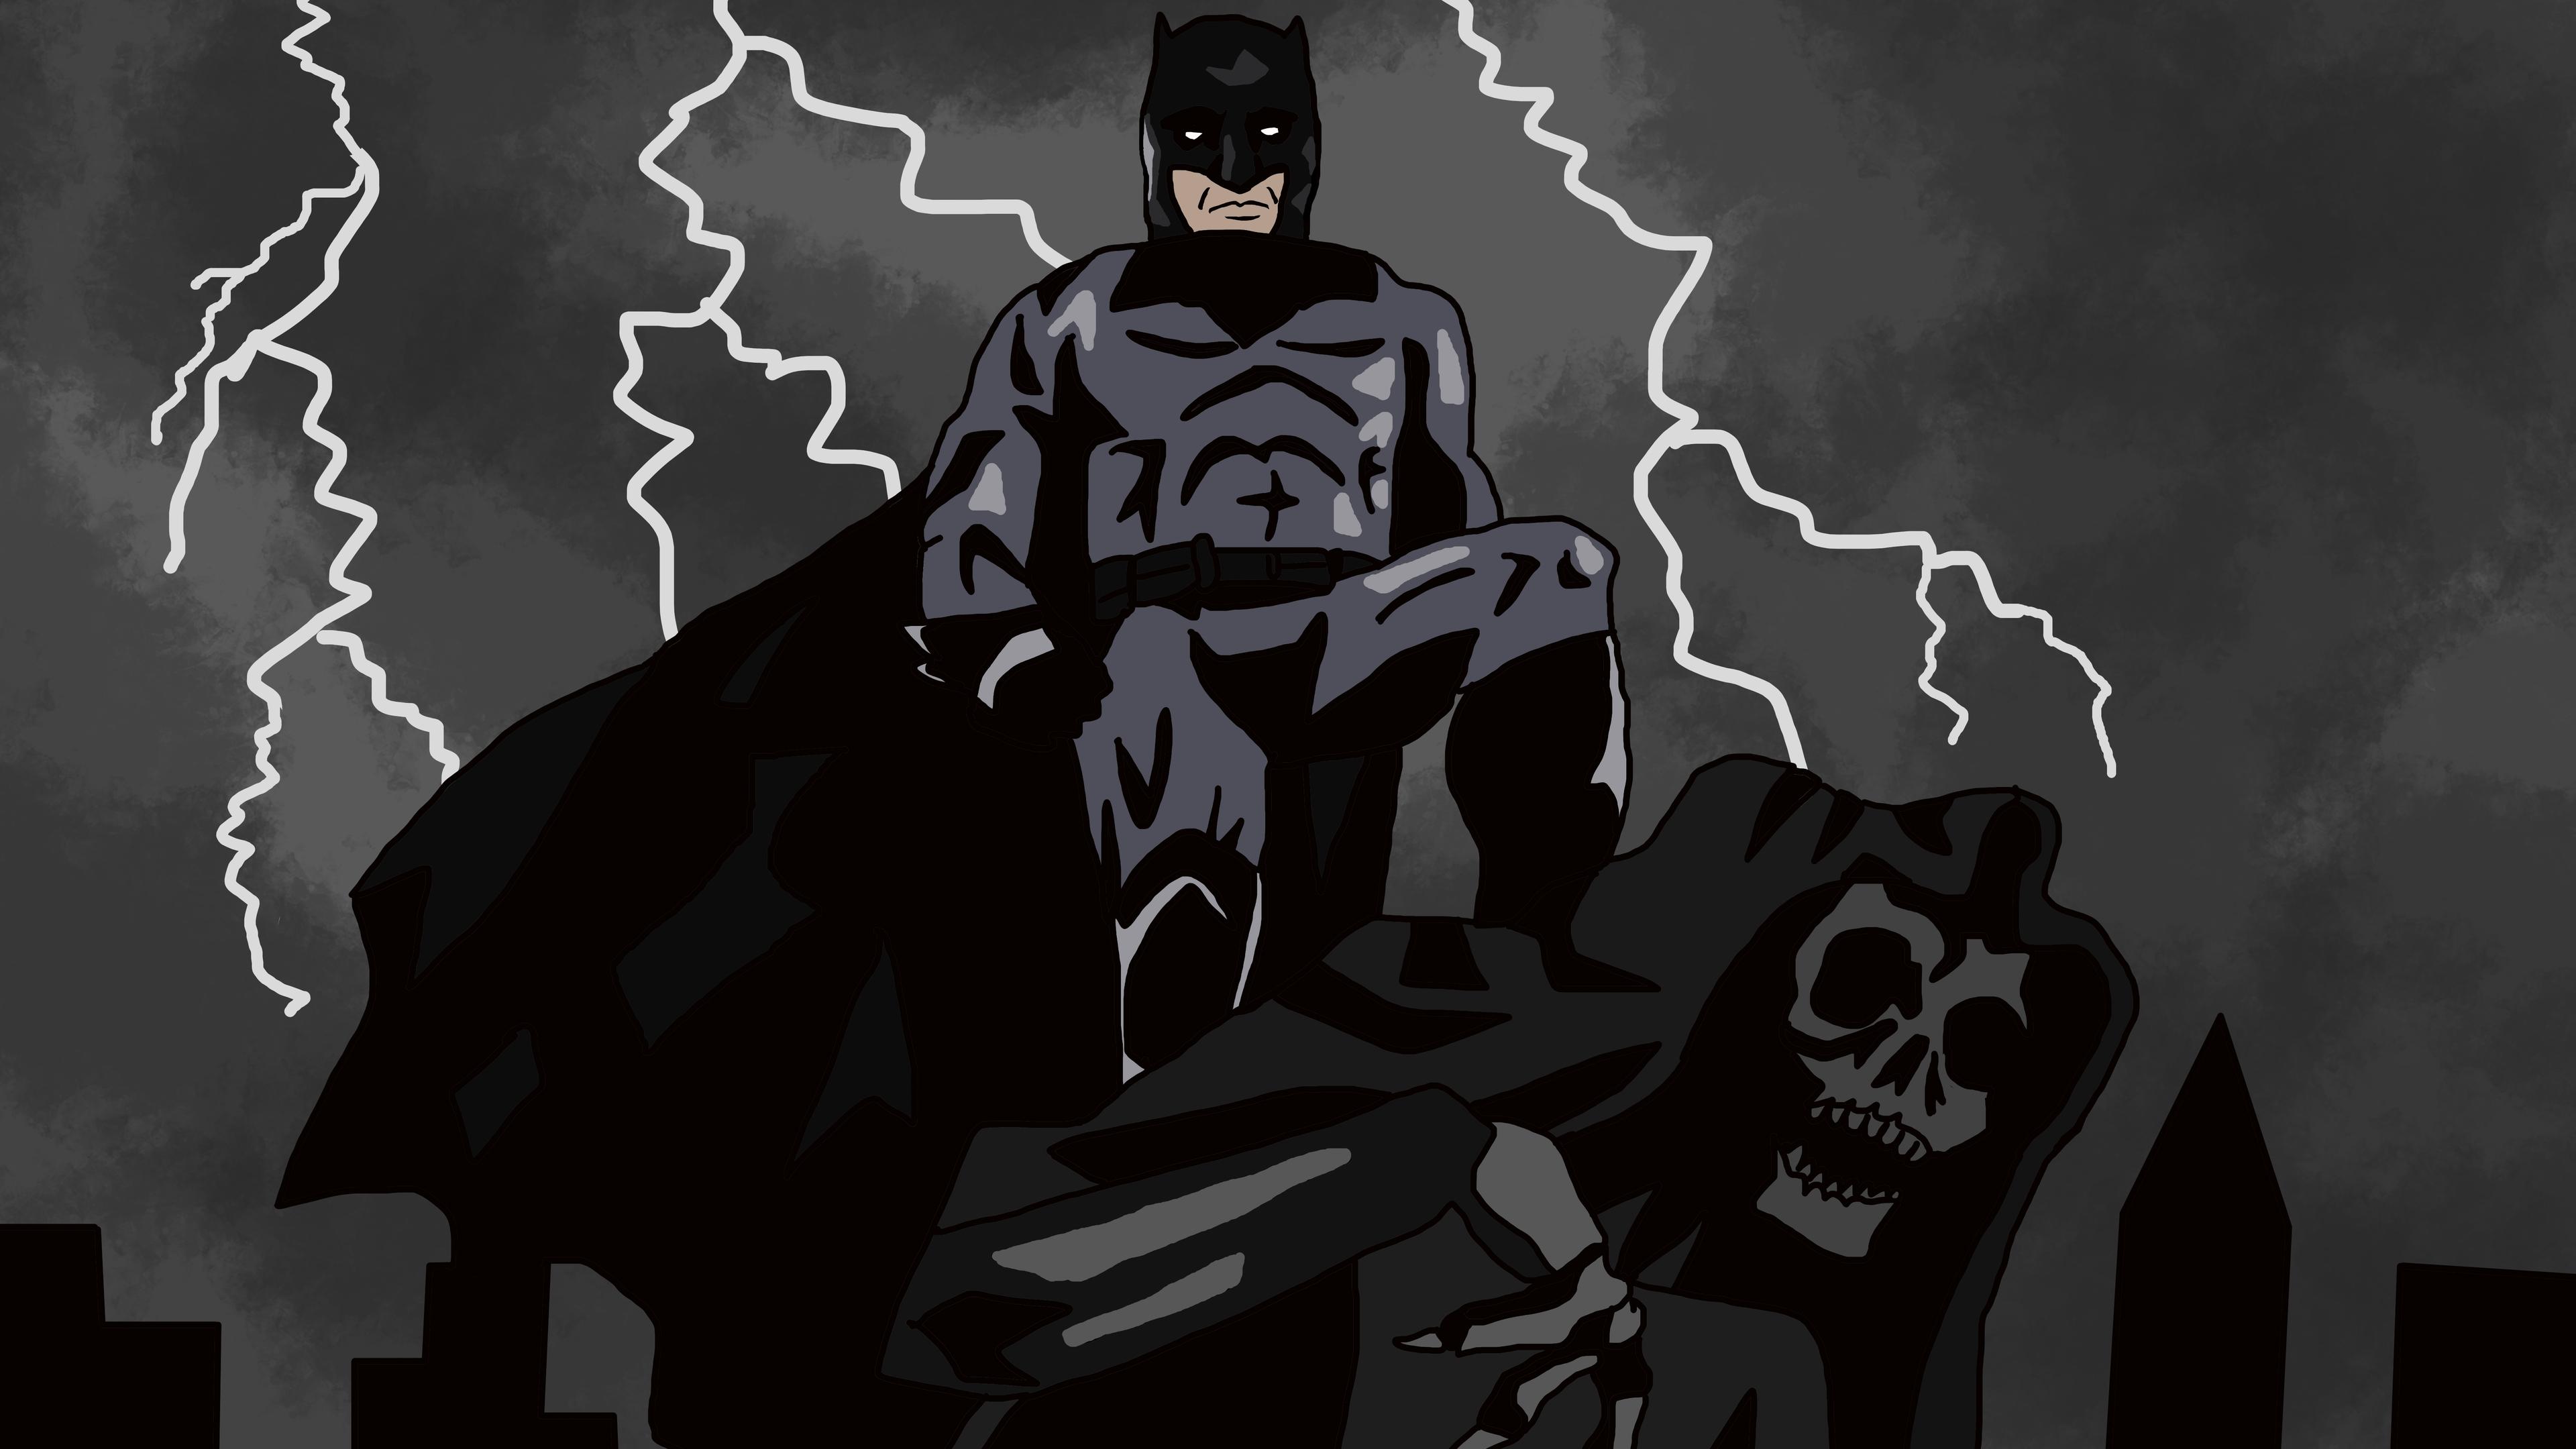 batman 5k artwork 1536520356 - Batman 5k Artwork - superheroes wallpapers, hd-wallpapers, digital art wallpapers, deviantart wallpapers, batman wallpapers, artwork wallpapers, artist wallpapers, 5k wallpapers, 4k-wallpapers